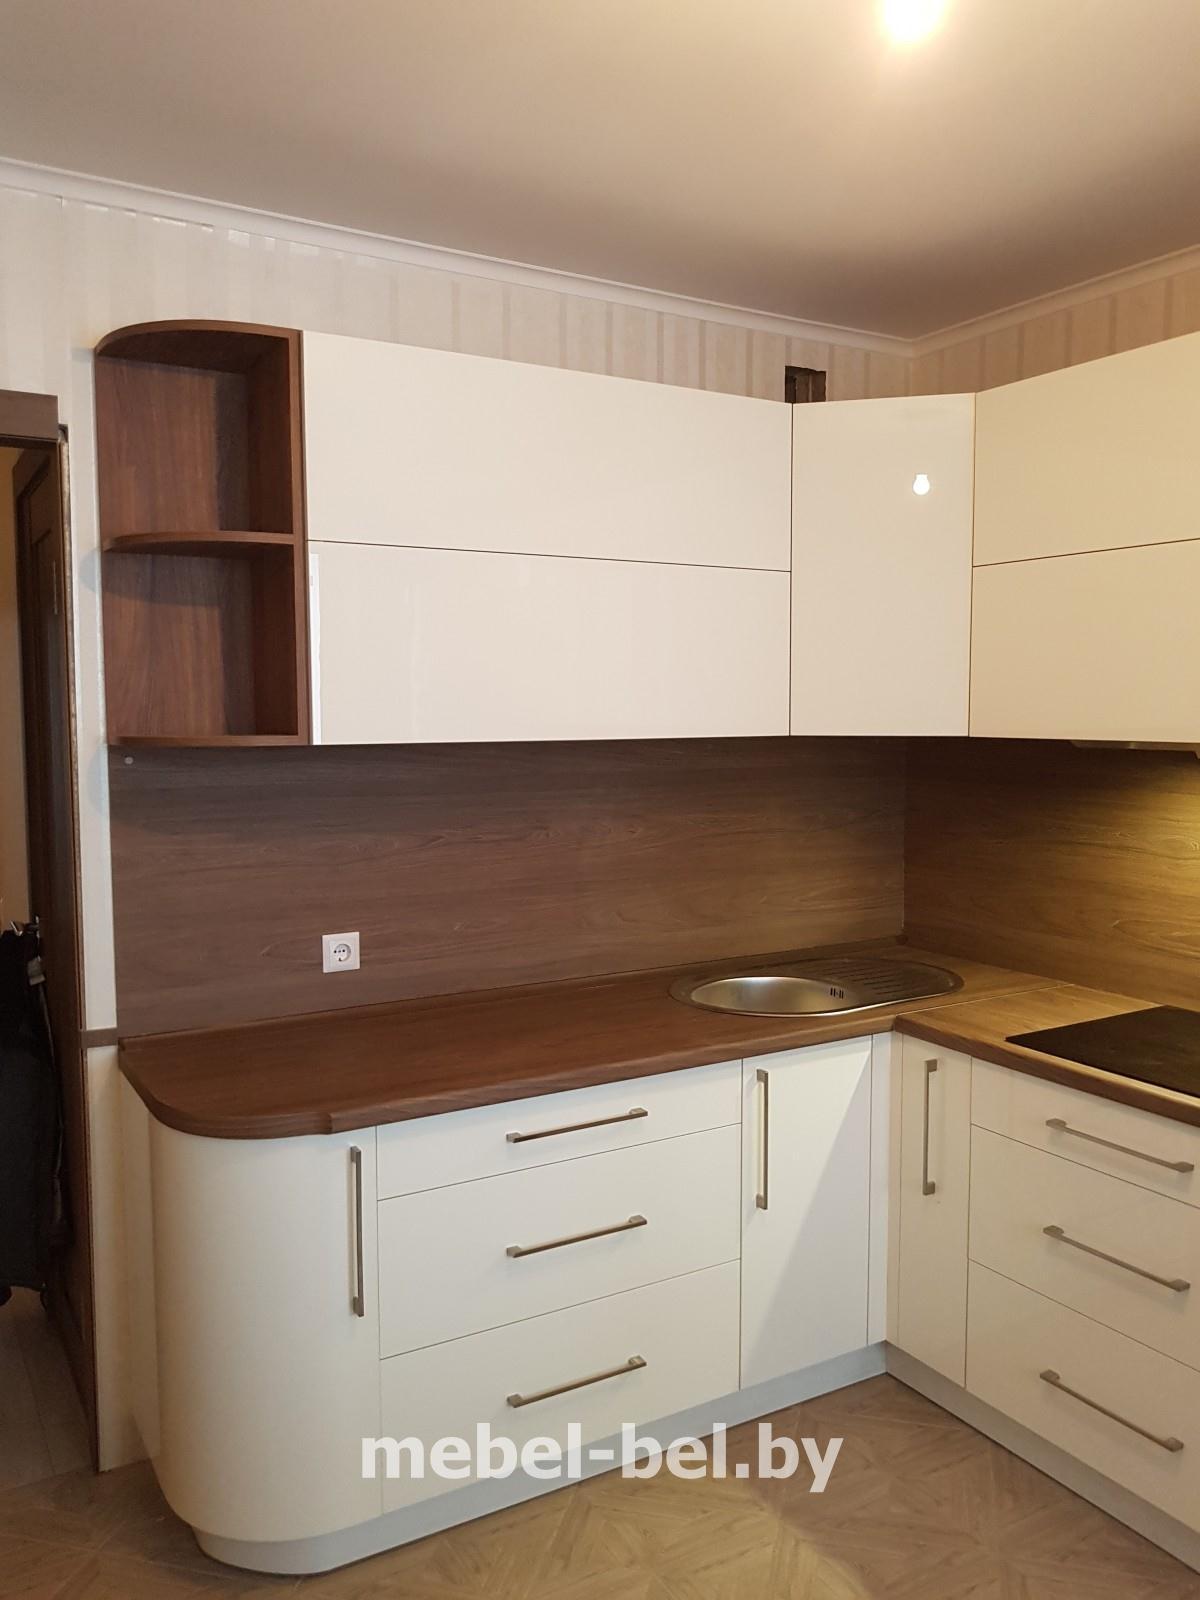 кухня бежевая с коричневым фото